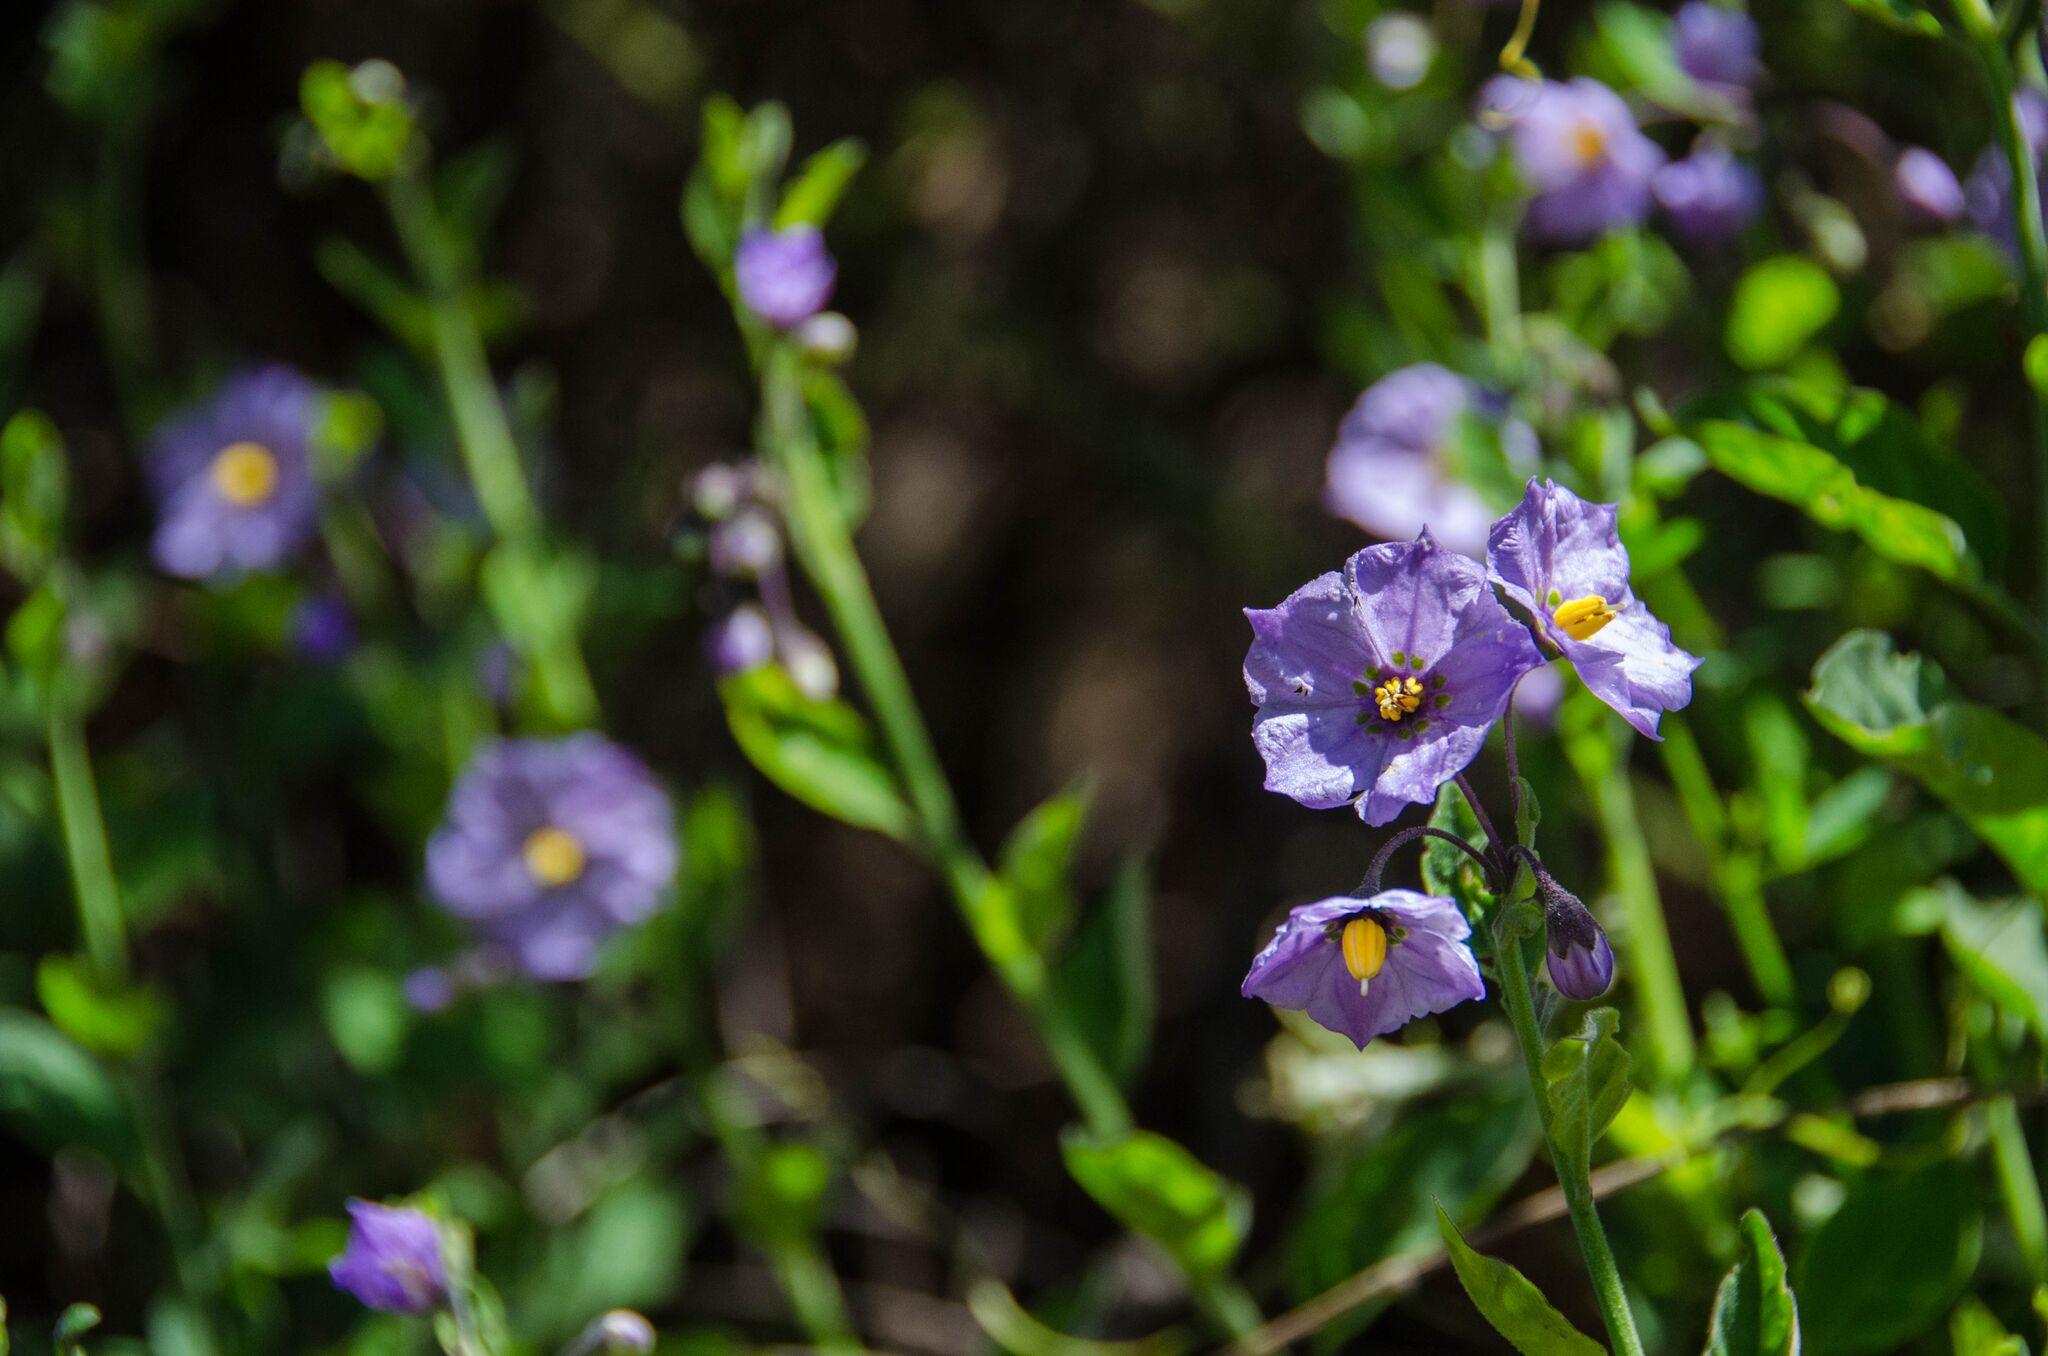 Mayfair-Trail_Rancho-Canada-del-Oro-Open-Space-Preserve_Cassie-Kifer-4_preview